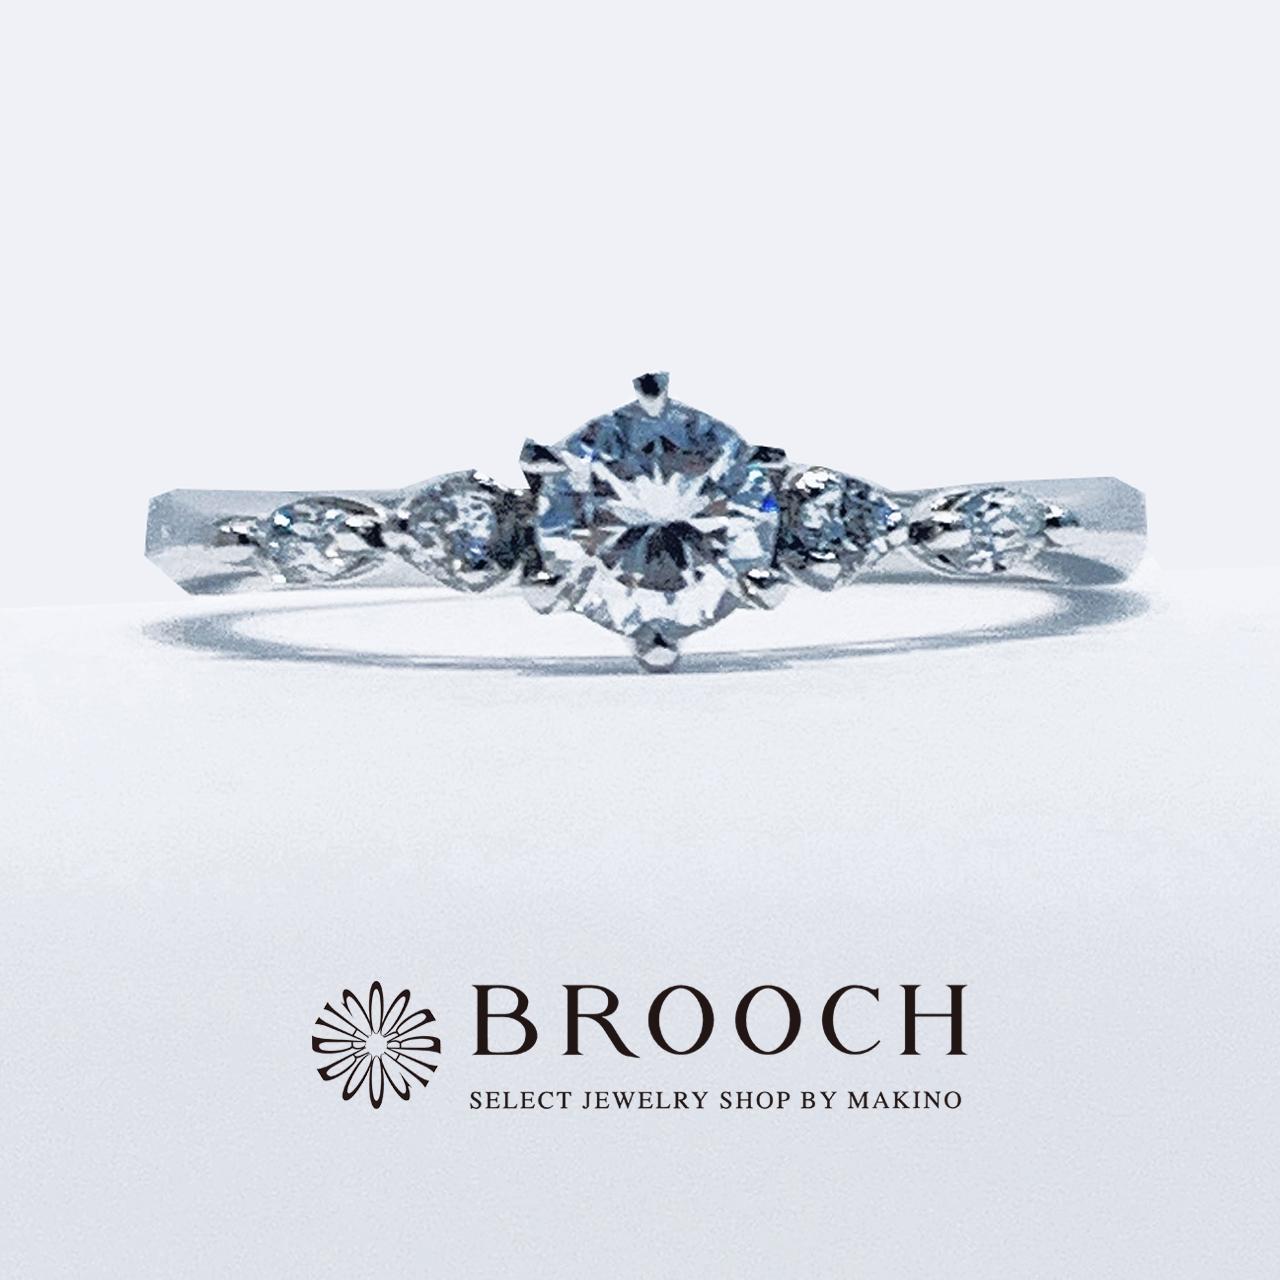 BROOCH 婚約指輪 エンゲージリング シンプル両サイドメレ